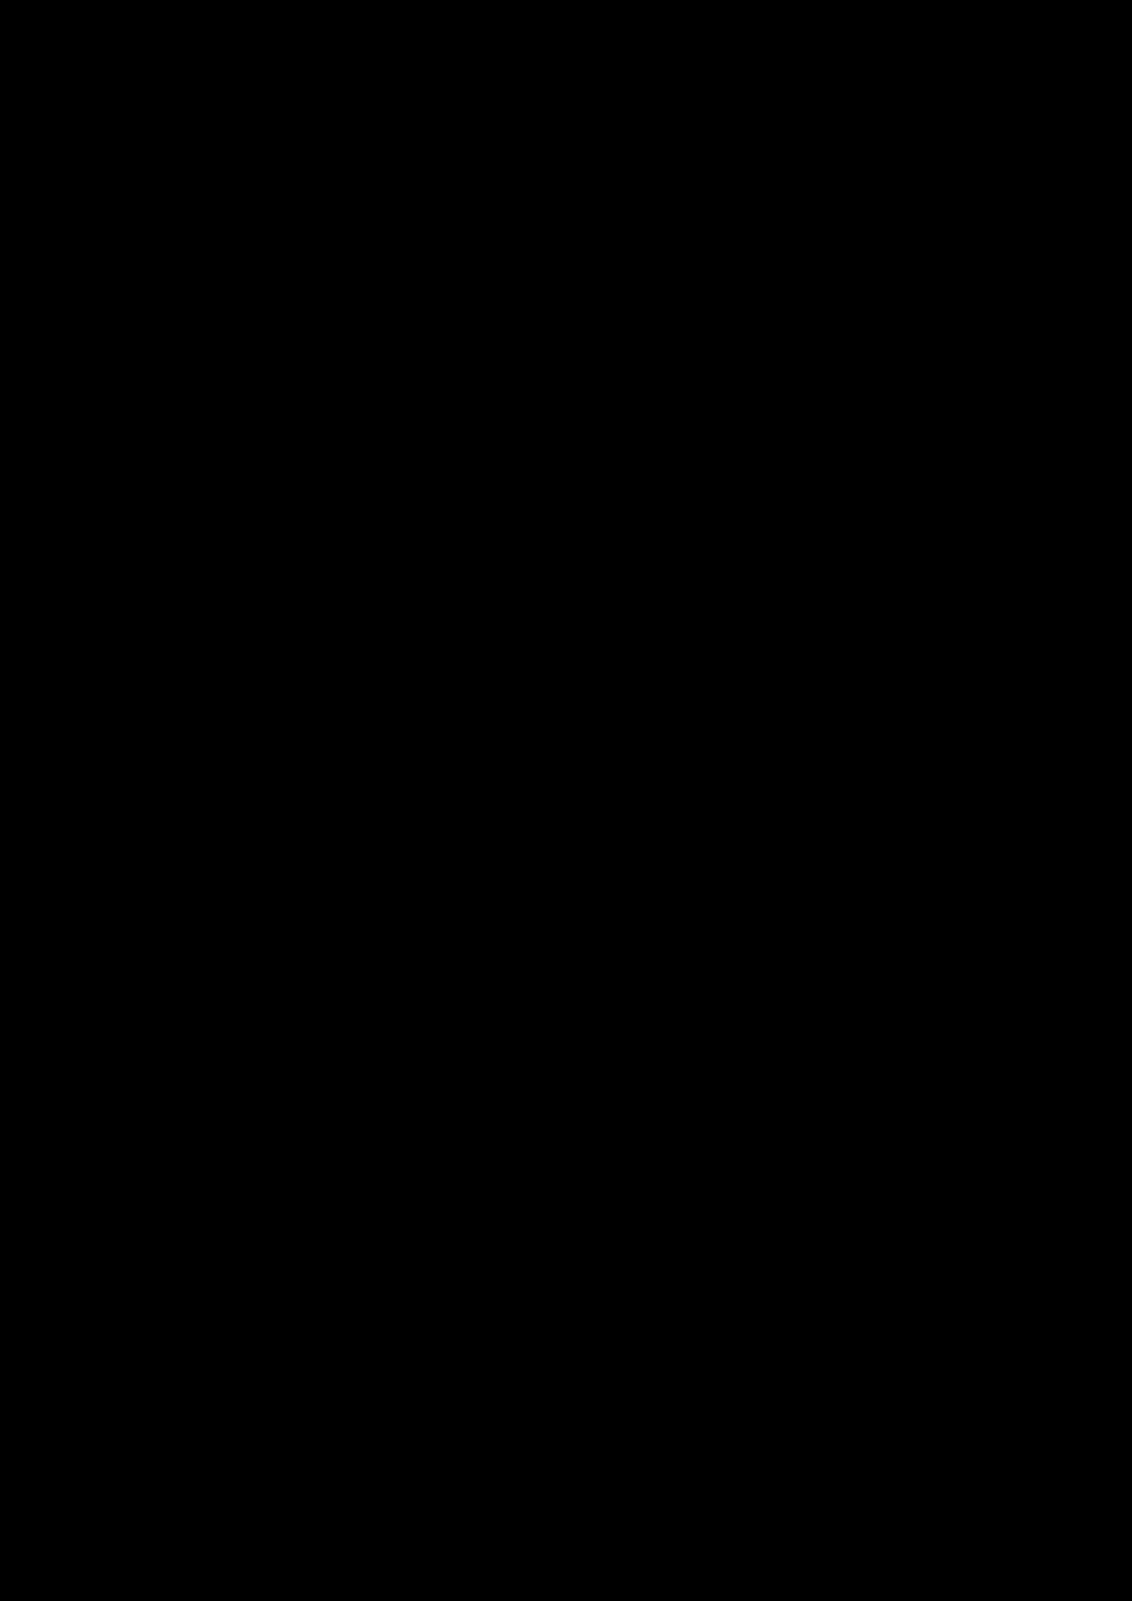 Belyiy sokol slide, Image 112